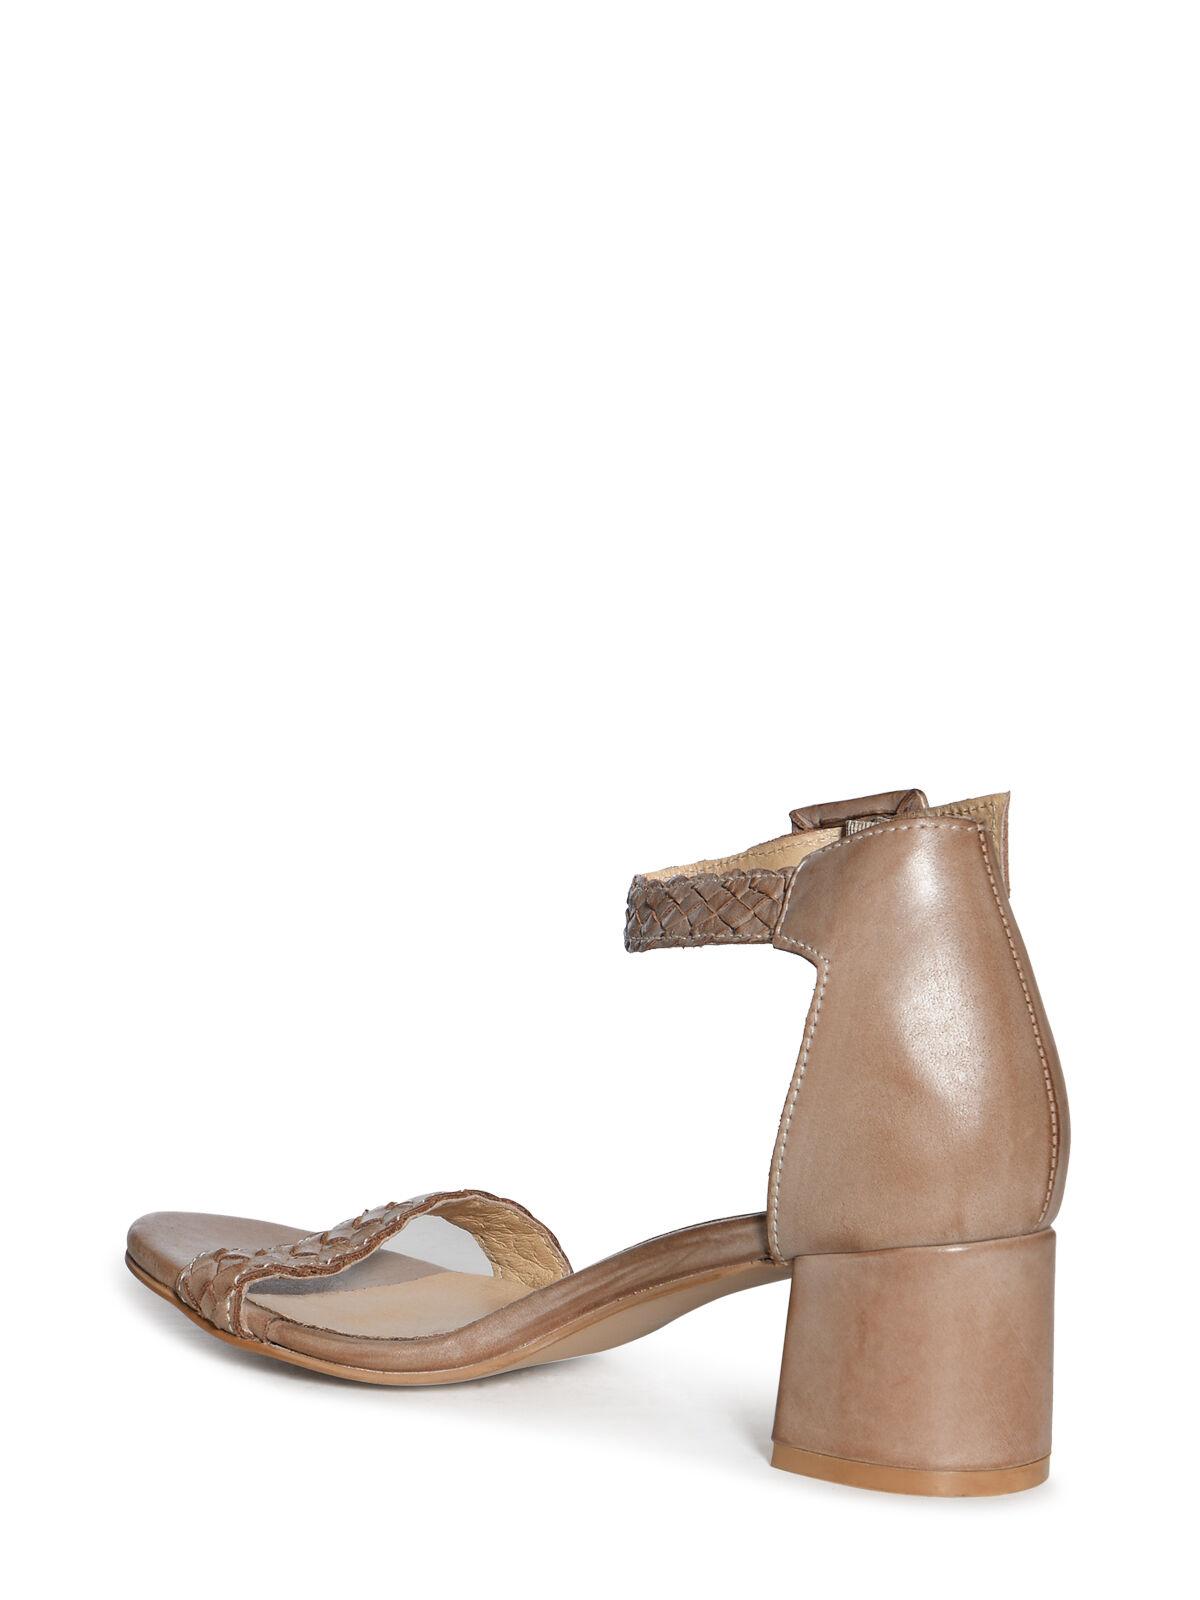 Sandalettes